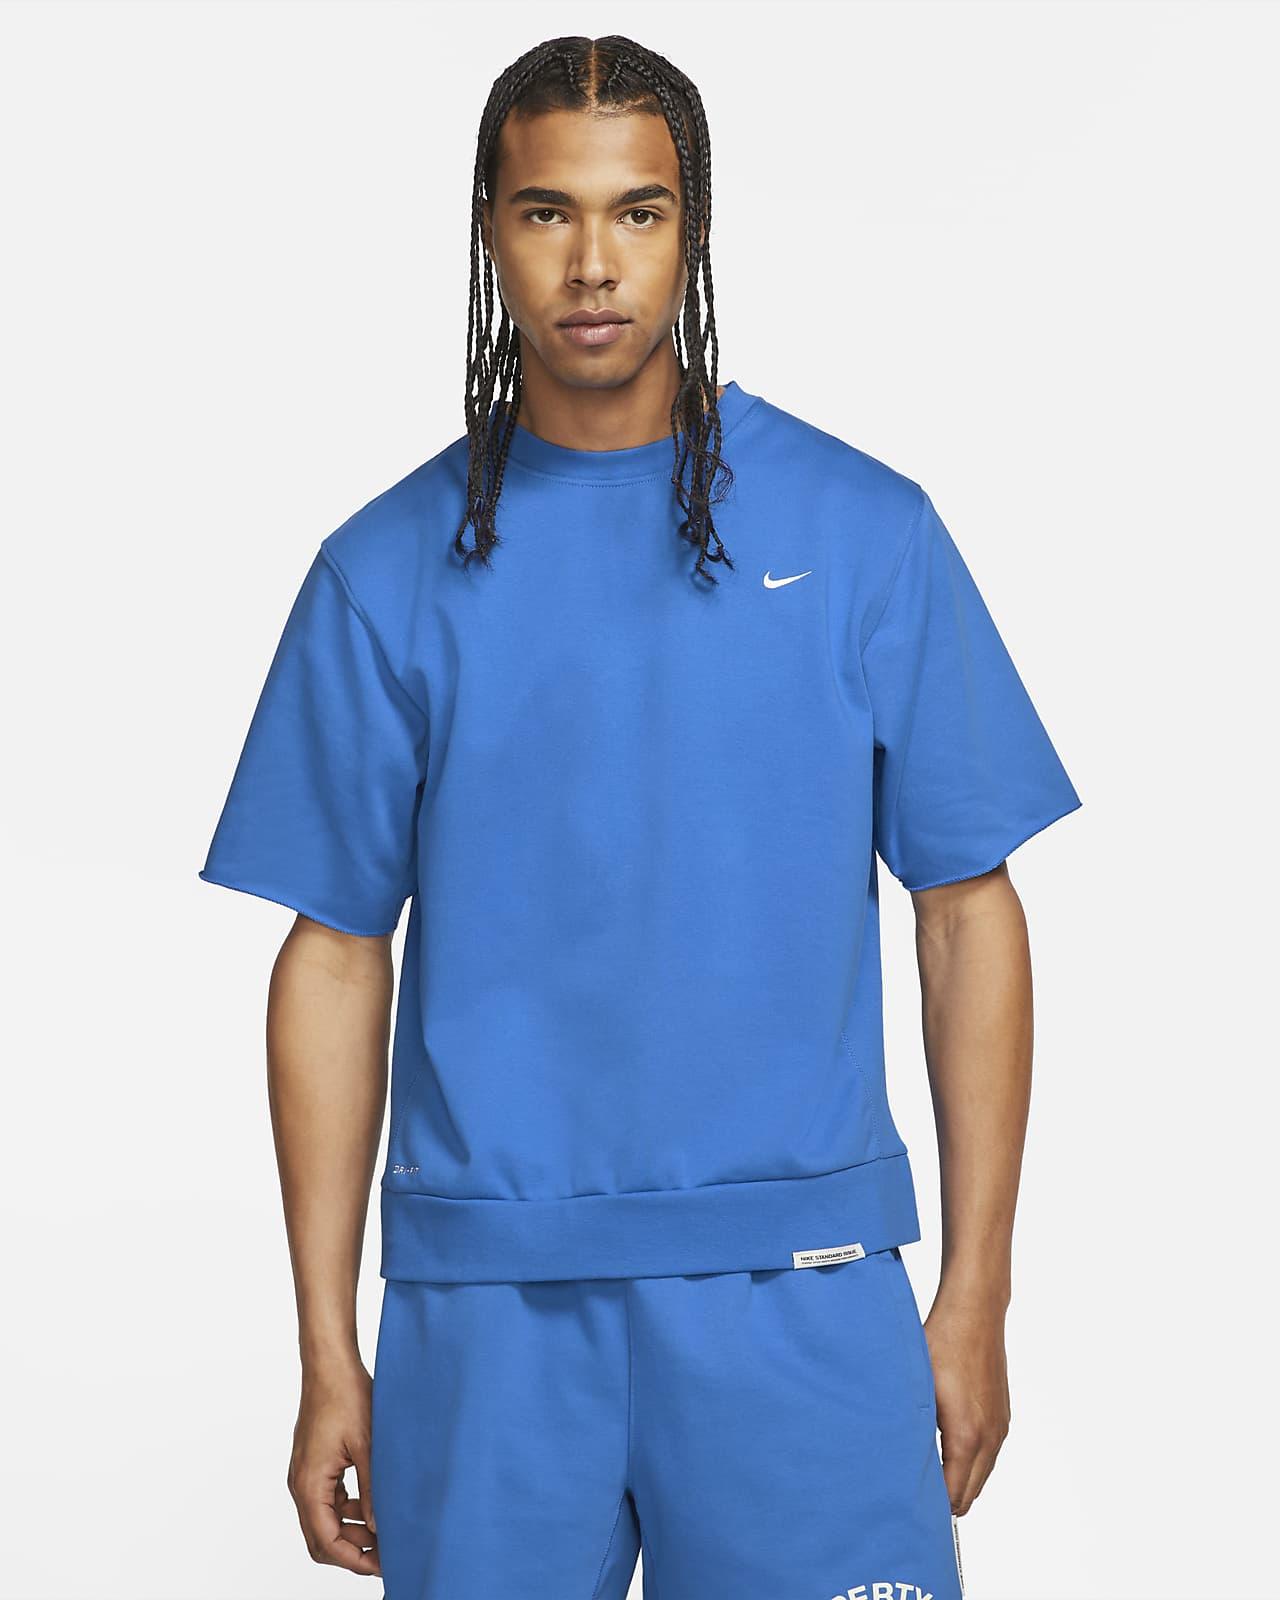 Nike Dri-FIT Standard Issue Men's Basketball Cutoff Crew Top